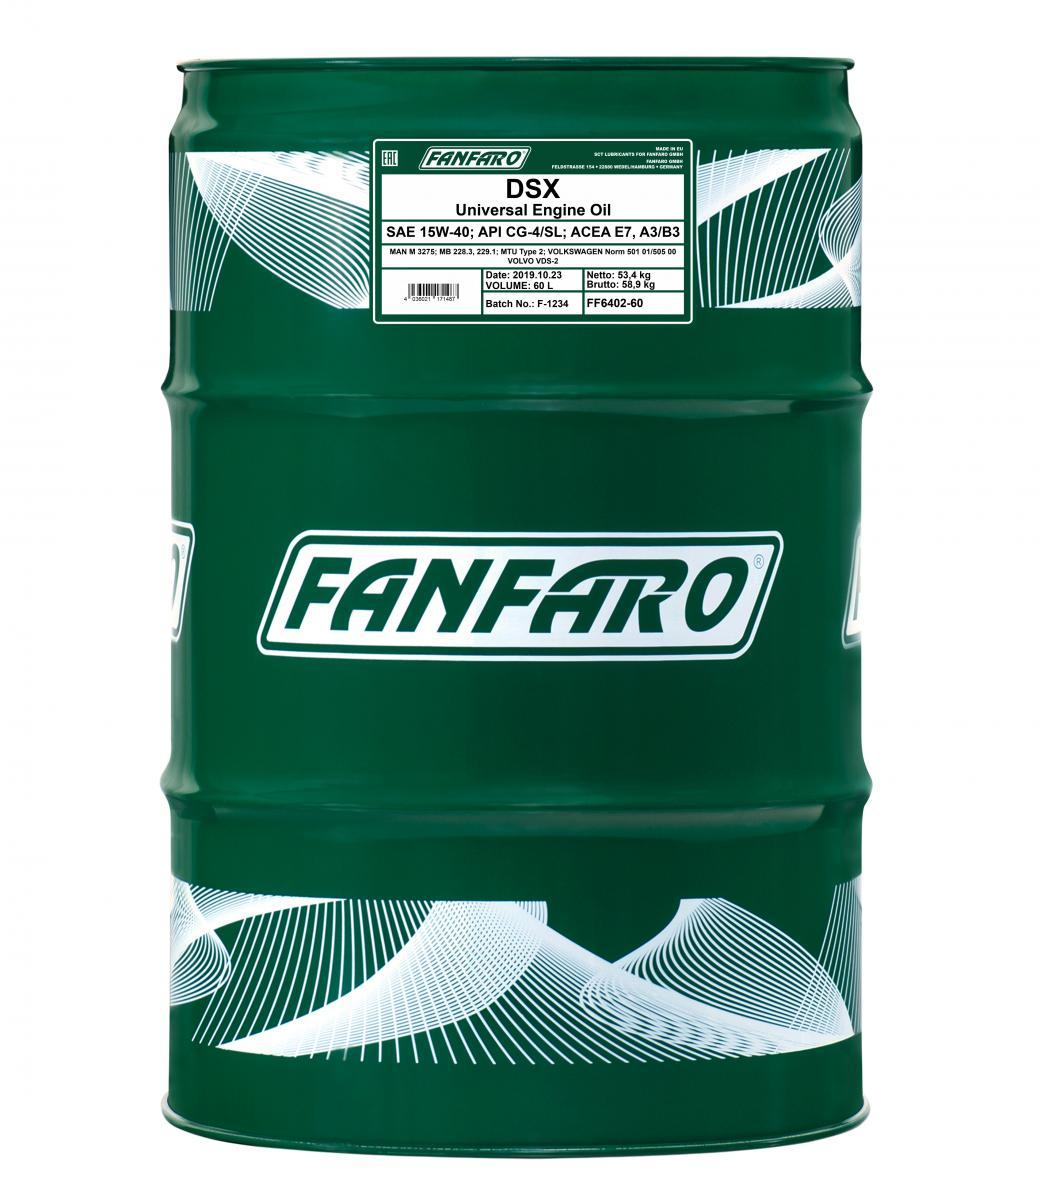 FF6402-60 FANFARO Master Line, DSX 15W-40, 60l, Mineralöl Motoröl FF6402-60 günstig kaufen